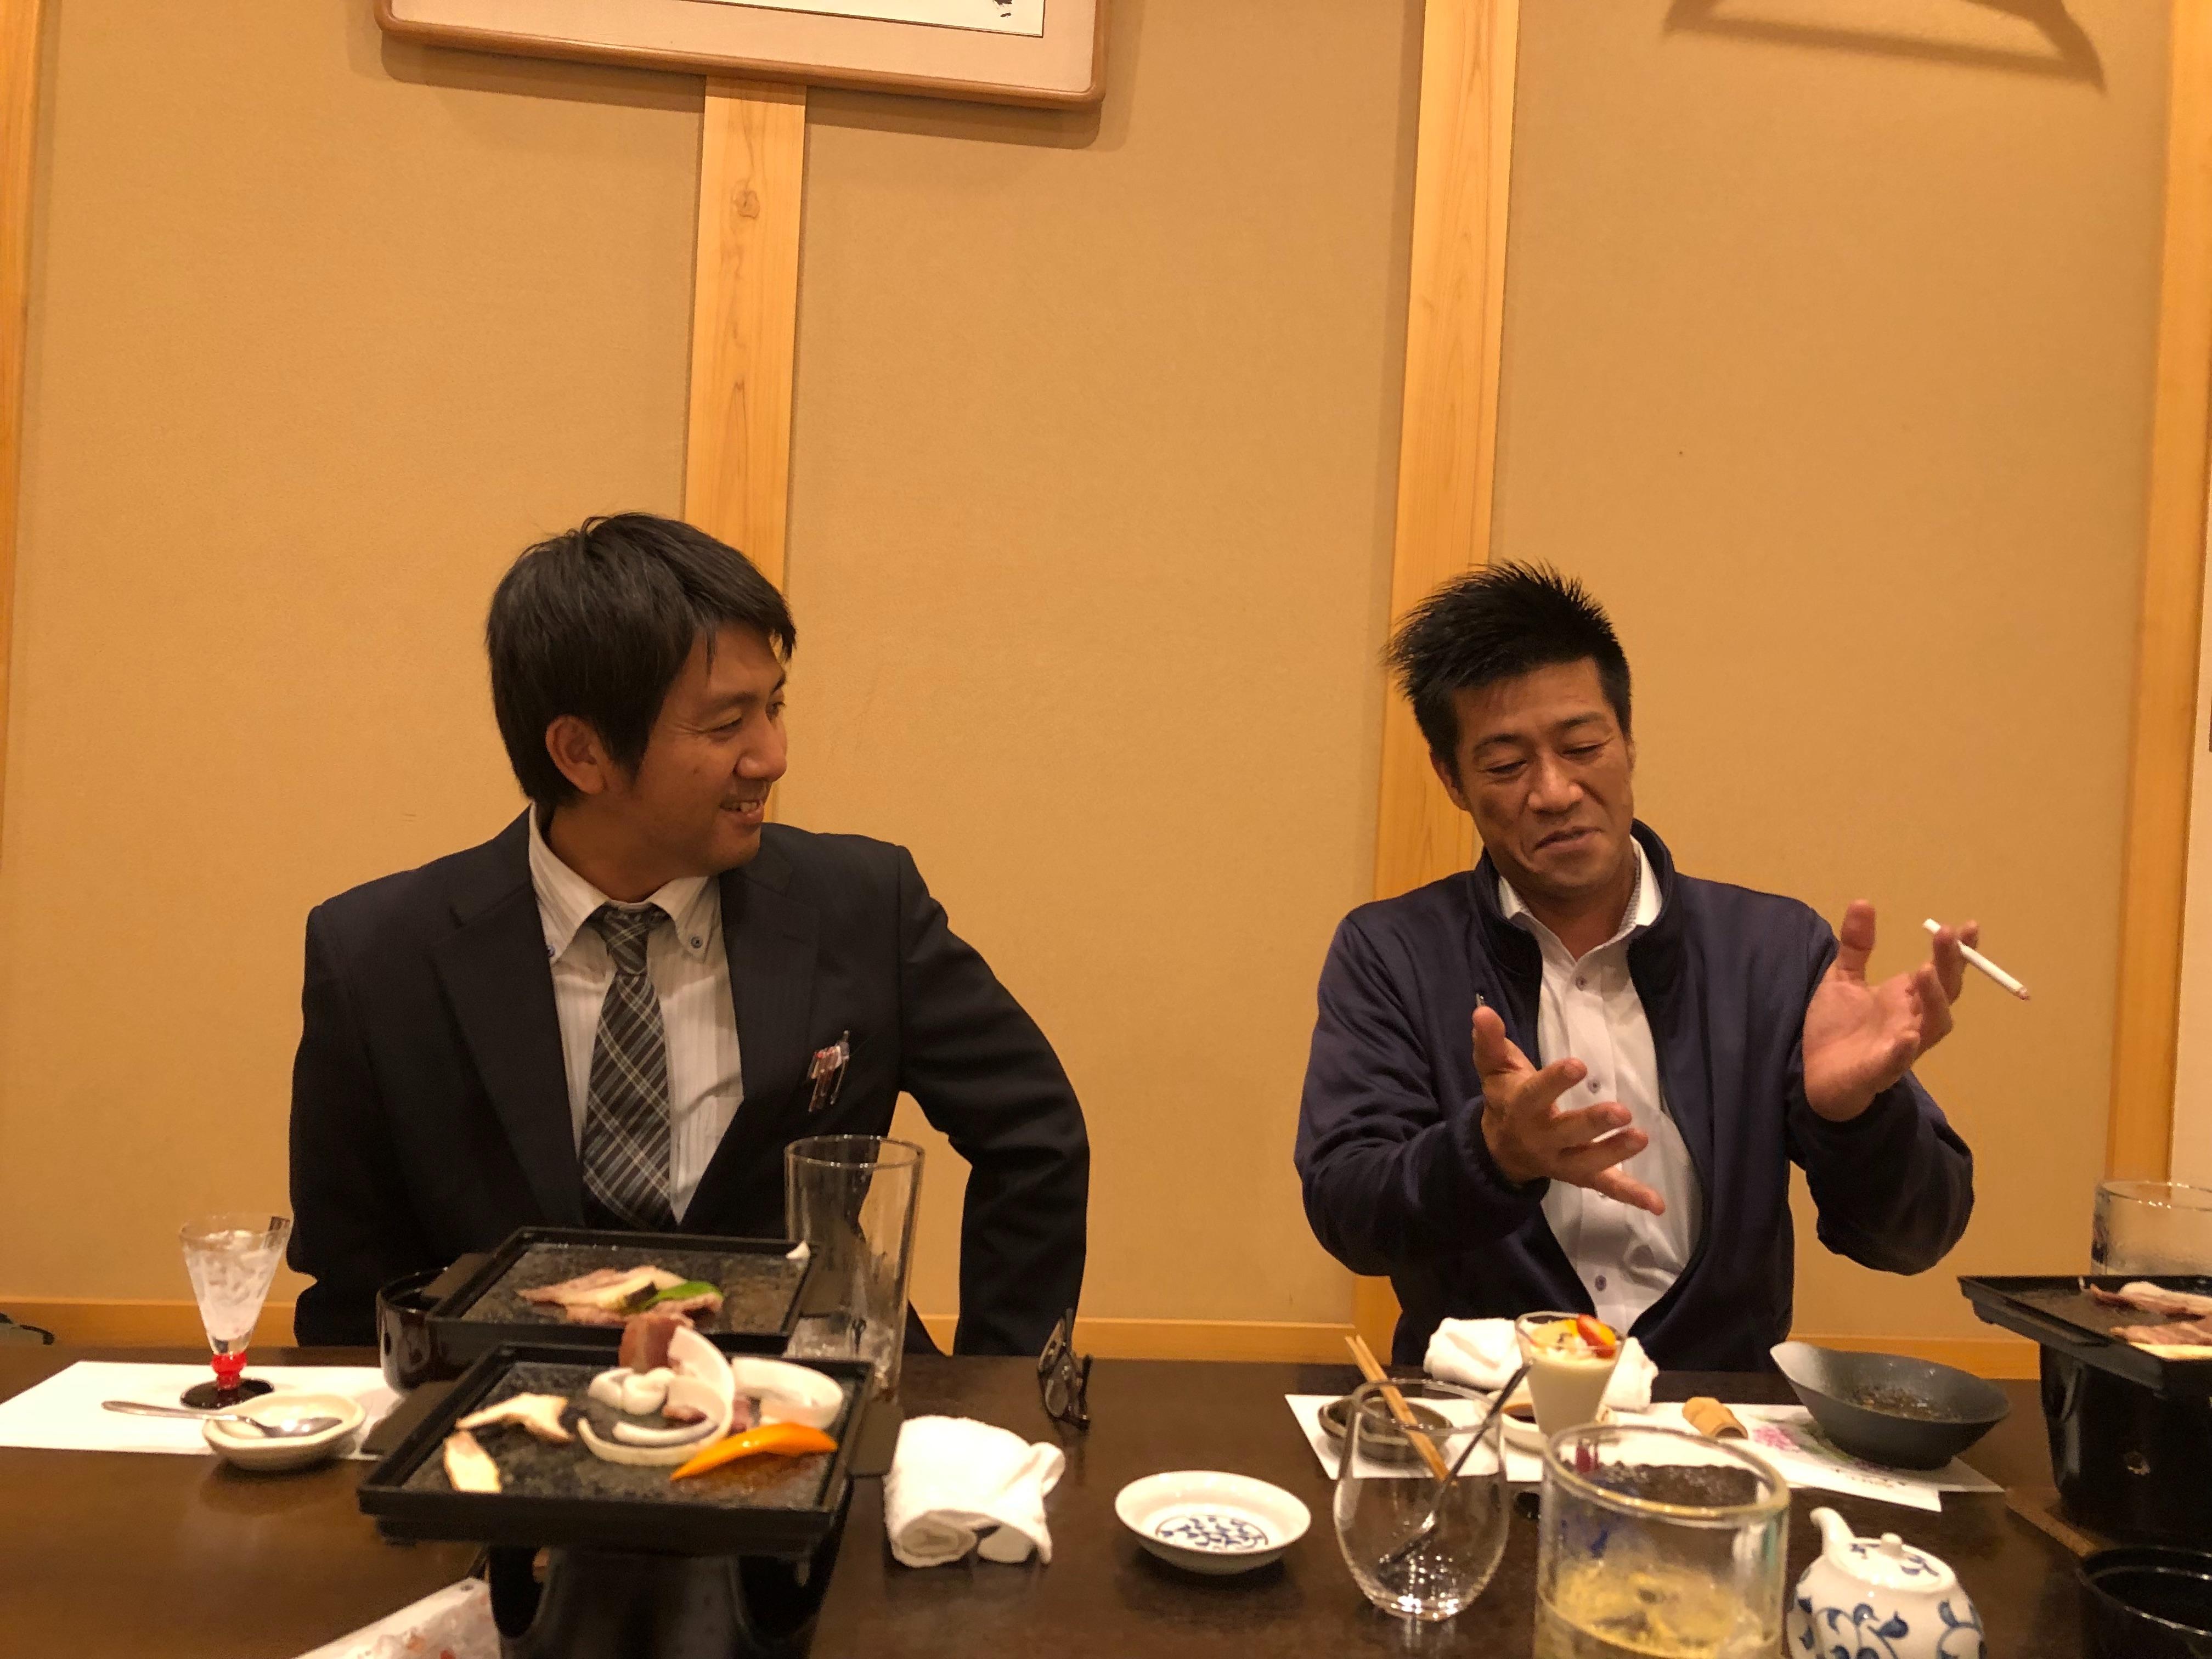 f:id:masanori-kato1972:20190604181044j:image